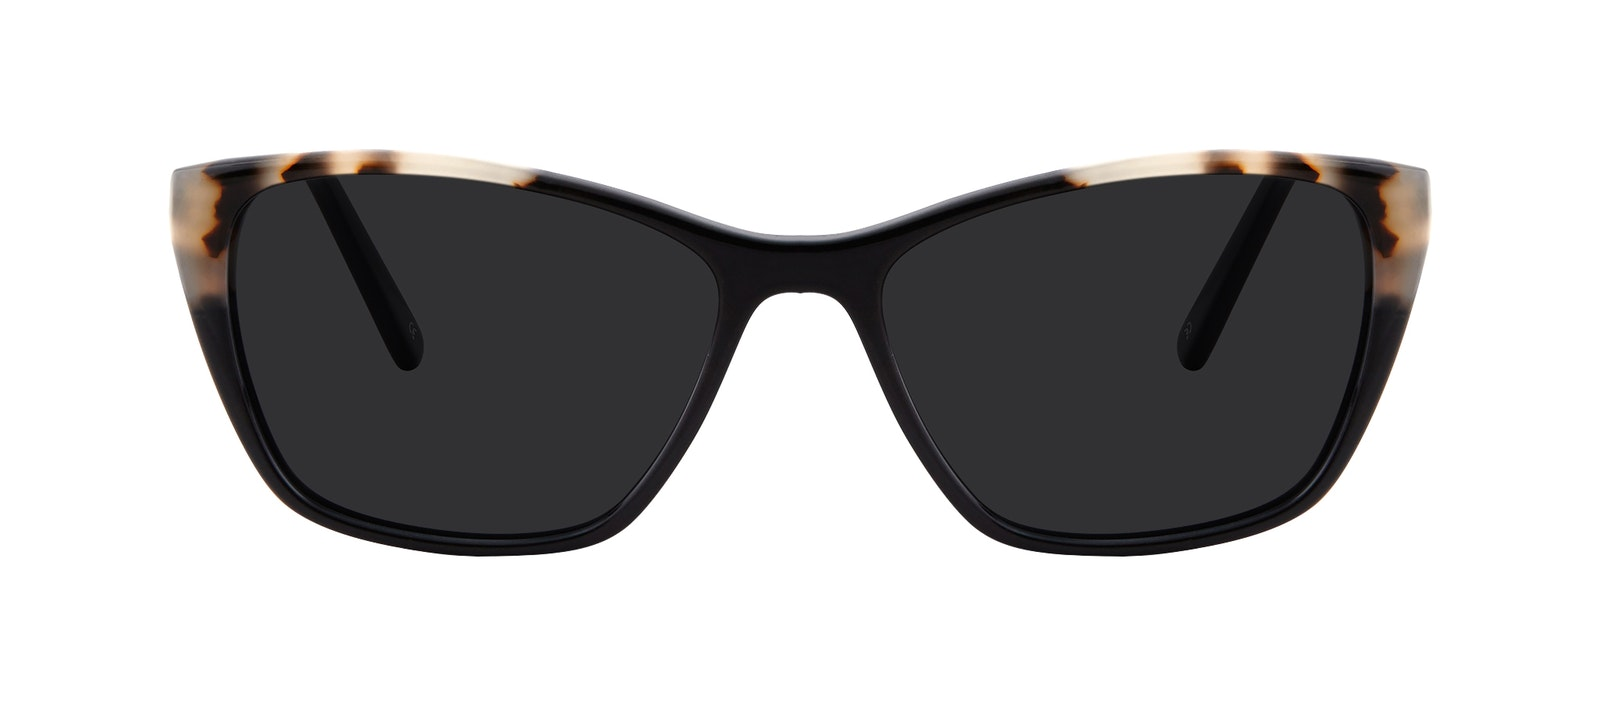 Affordable Fashion Glasses Cat Eye Rectangle Sunglasses Women Myrtle Ebony Granite Front